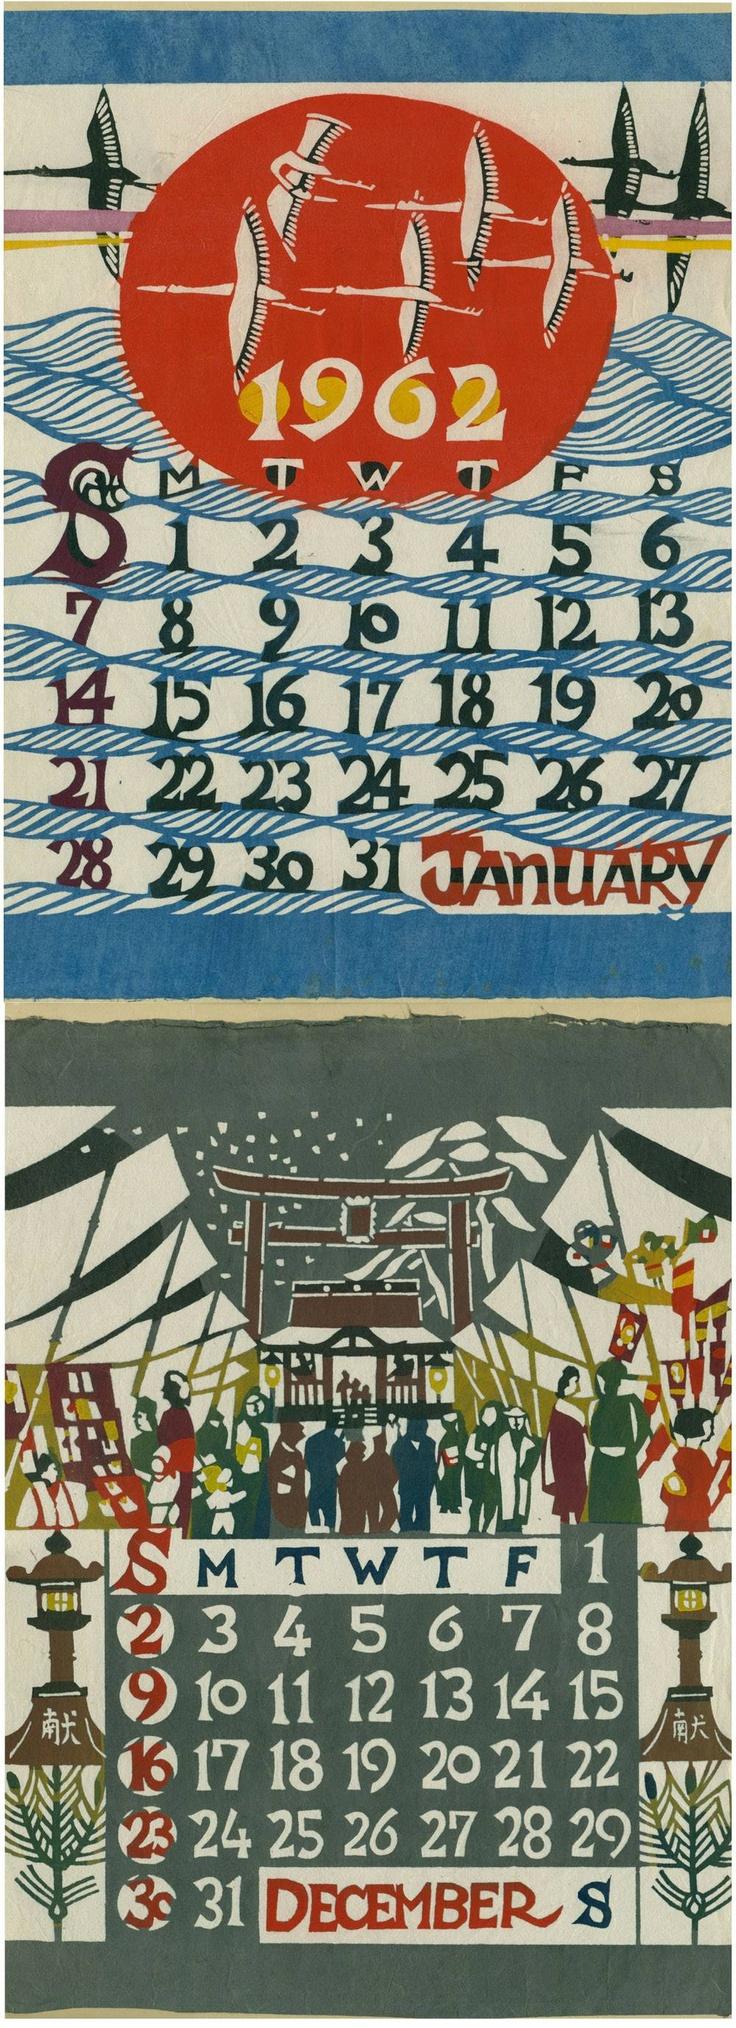 1962 calendar - Keisuke Serizawa (芹沢 銈介 Serizawa Keisuke?, May 13, 1895 - April 5, 1984)